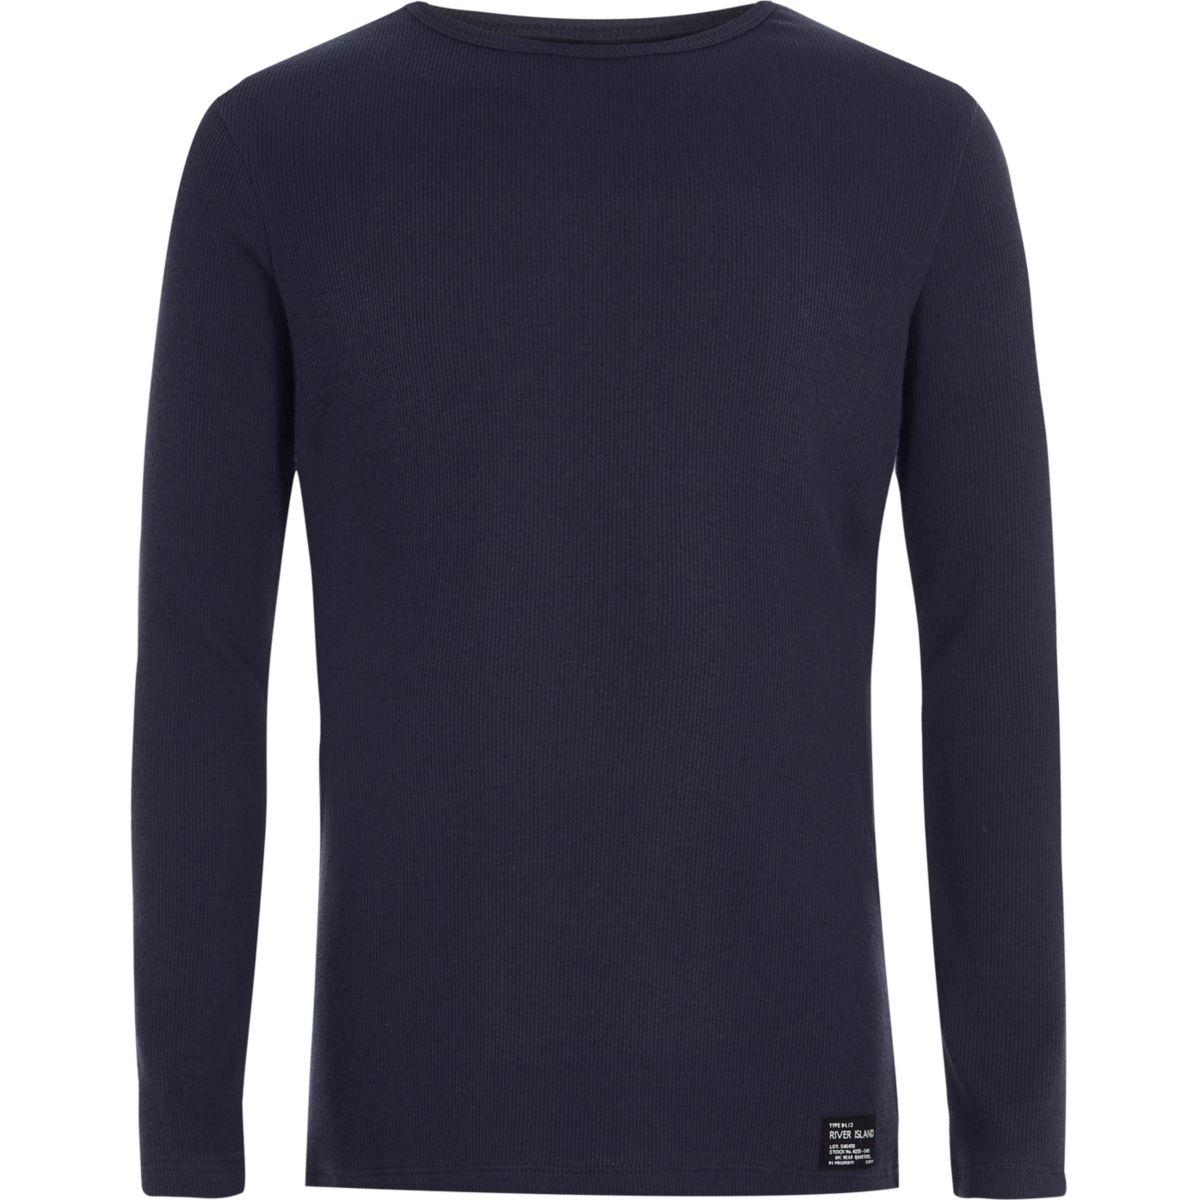 Boys navy ribbed long sleeve T-shirt